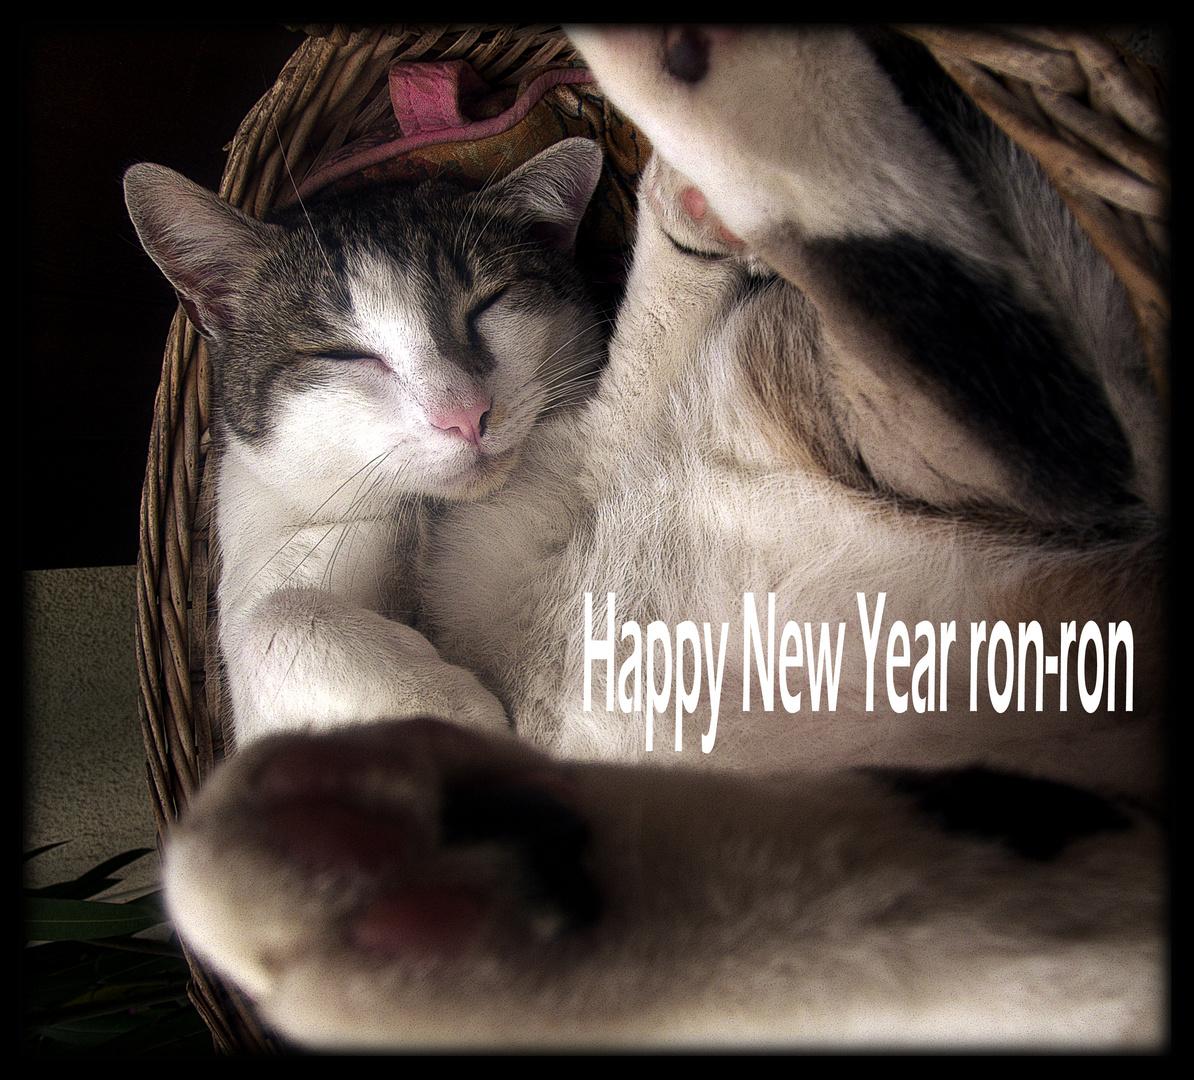 Happy New Year ron-ron